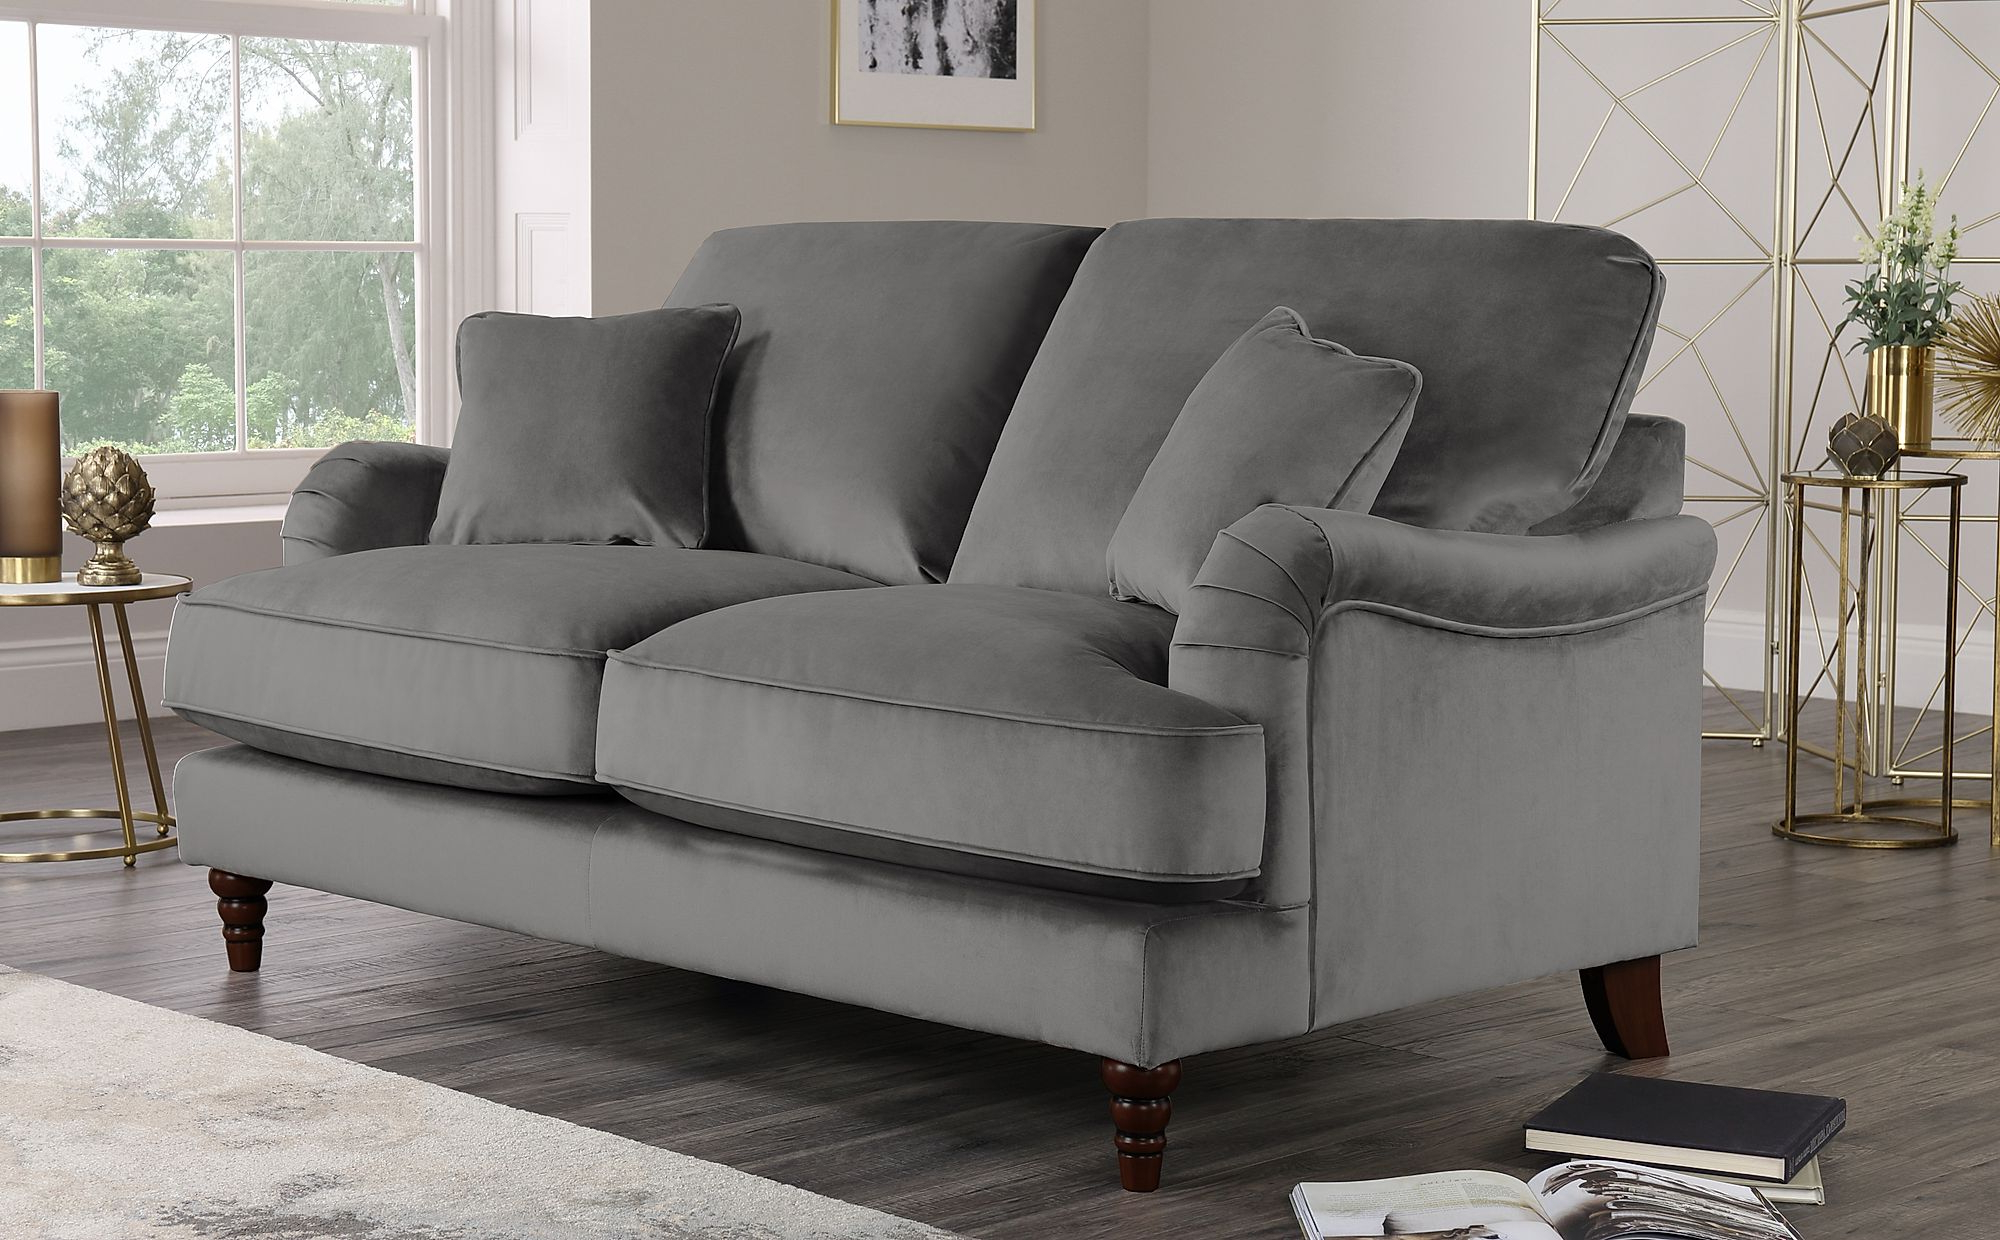 Fashionable Gray Sofas Intended For Charleston Grey Velvet 2 Seater Sofa (View 19 of 20)